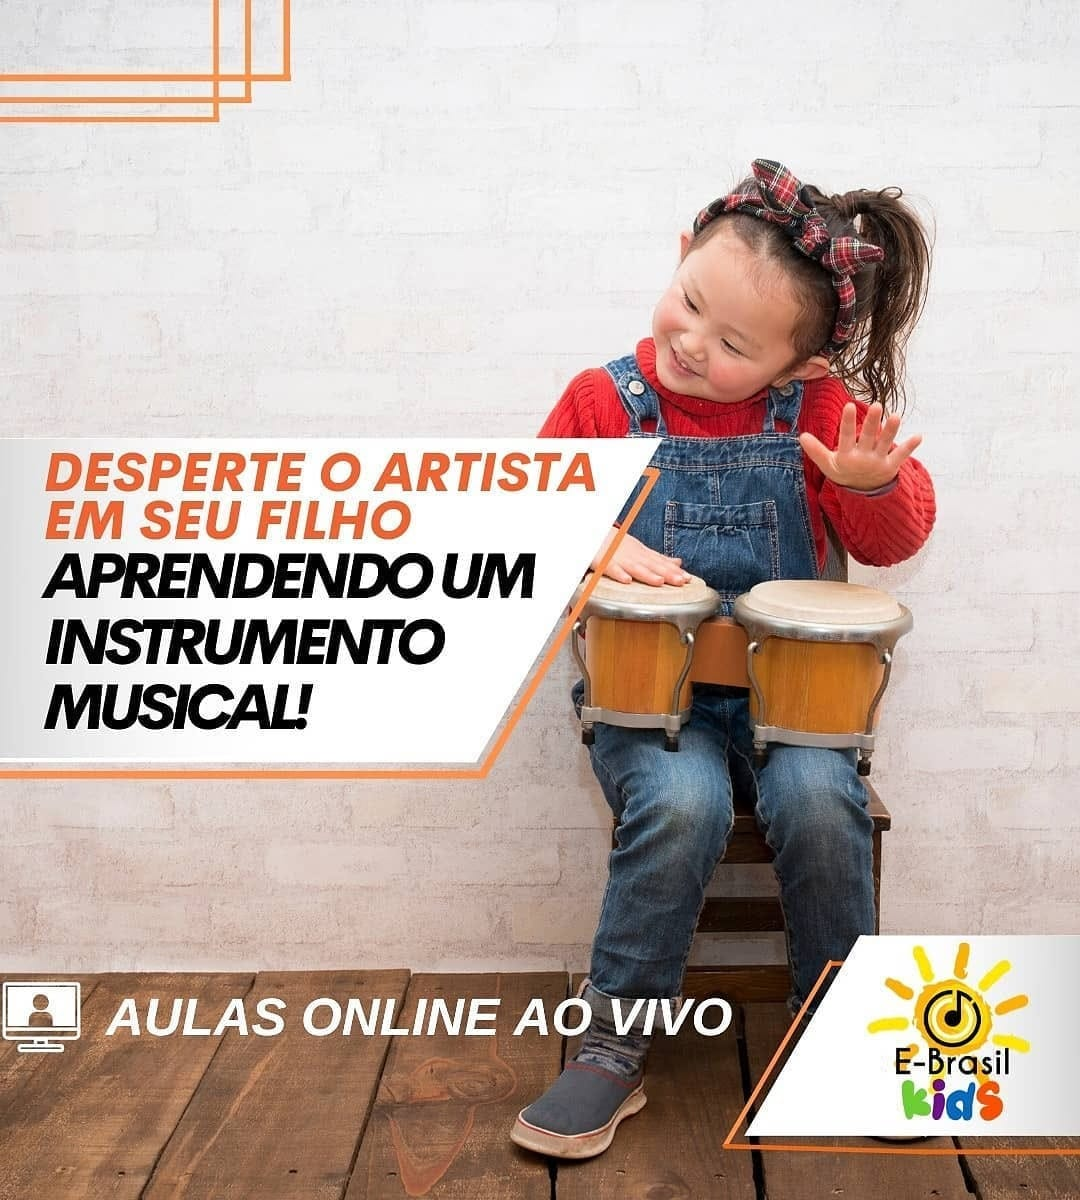 E-Brasil Escola de Música - Aulas Online ou Presencial